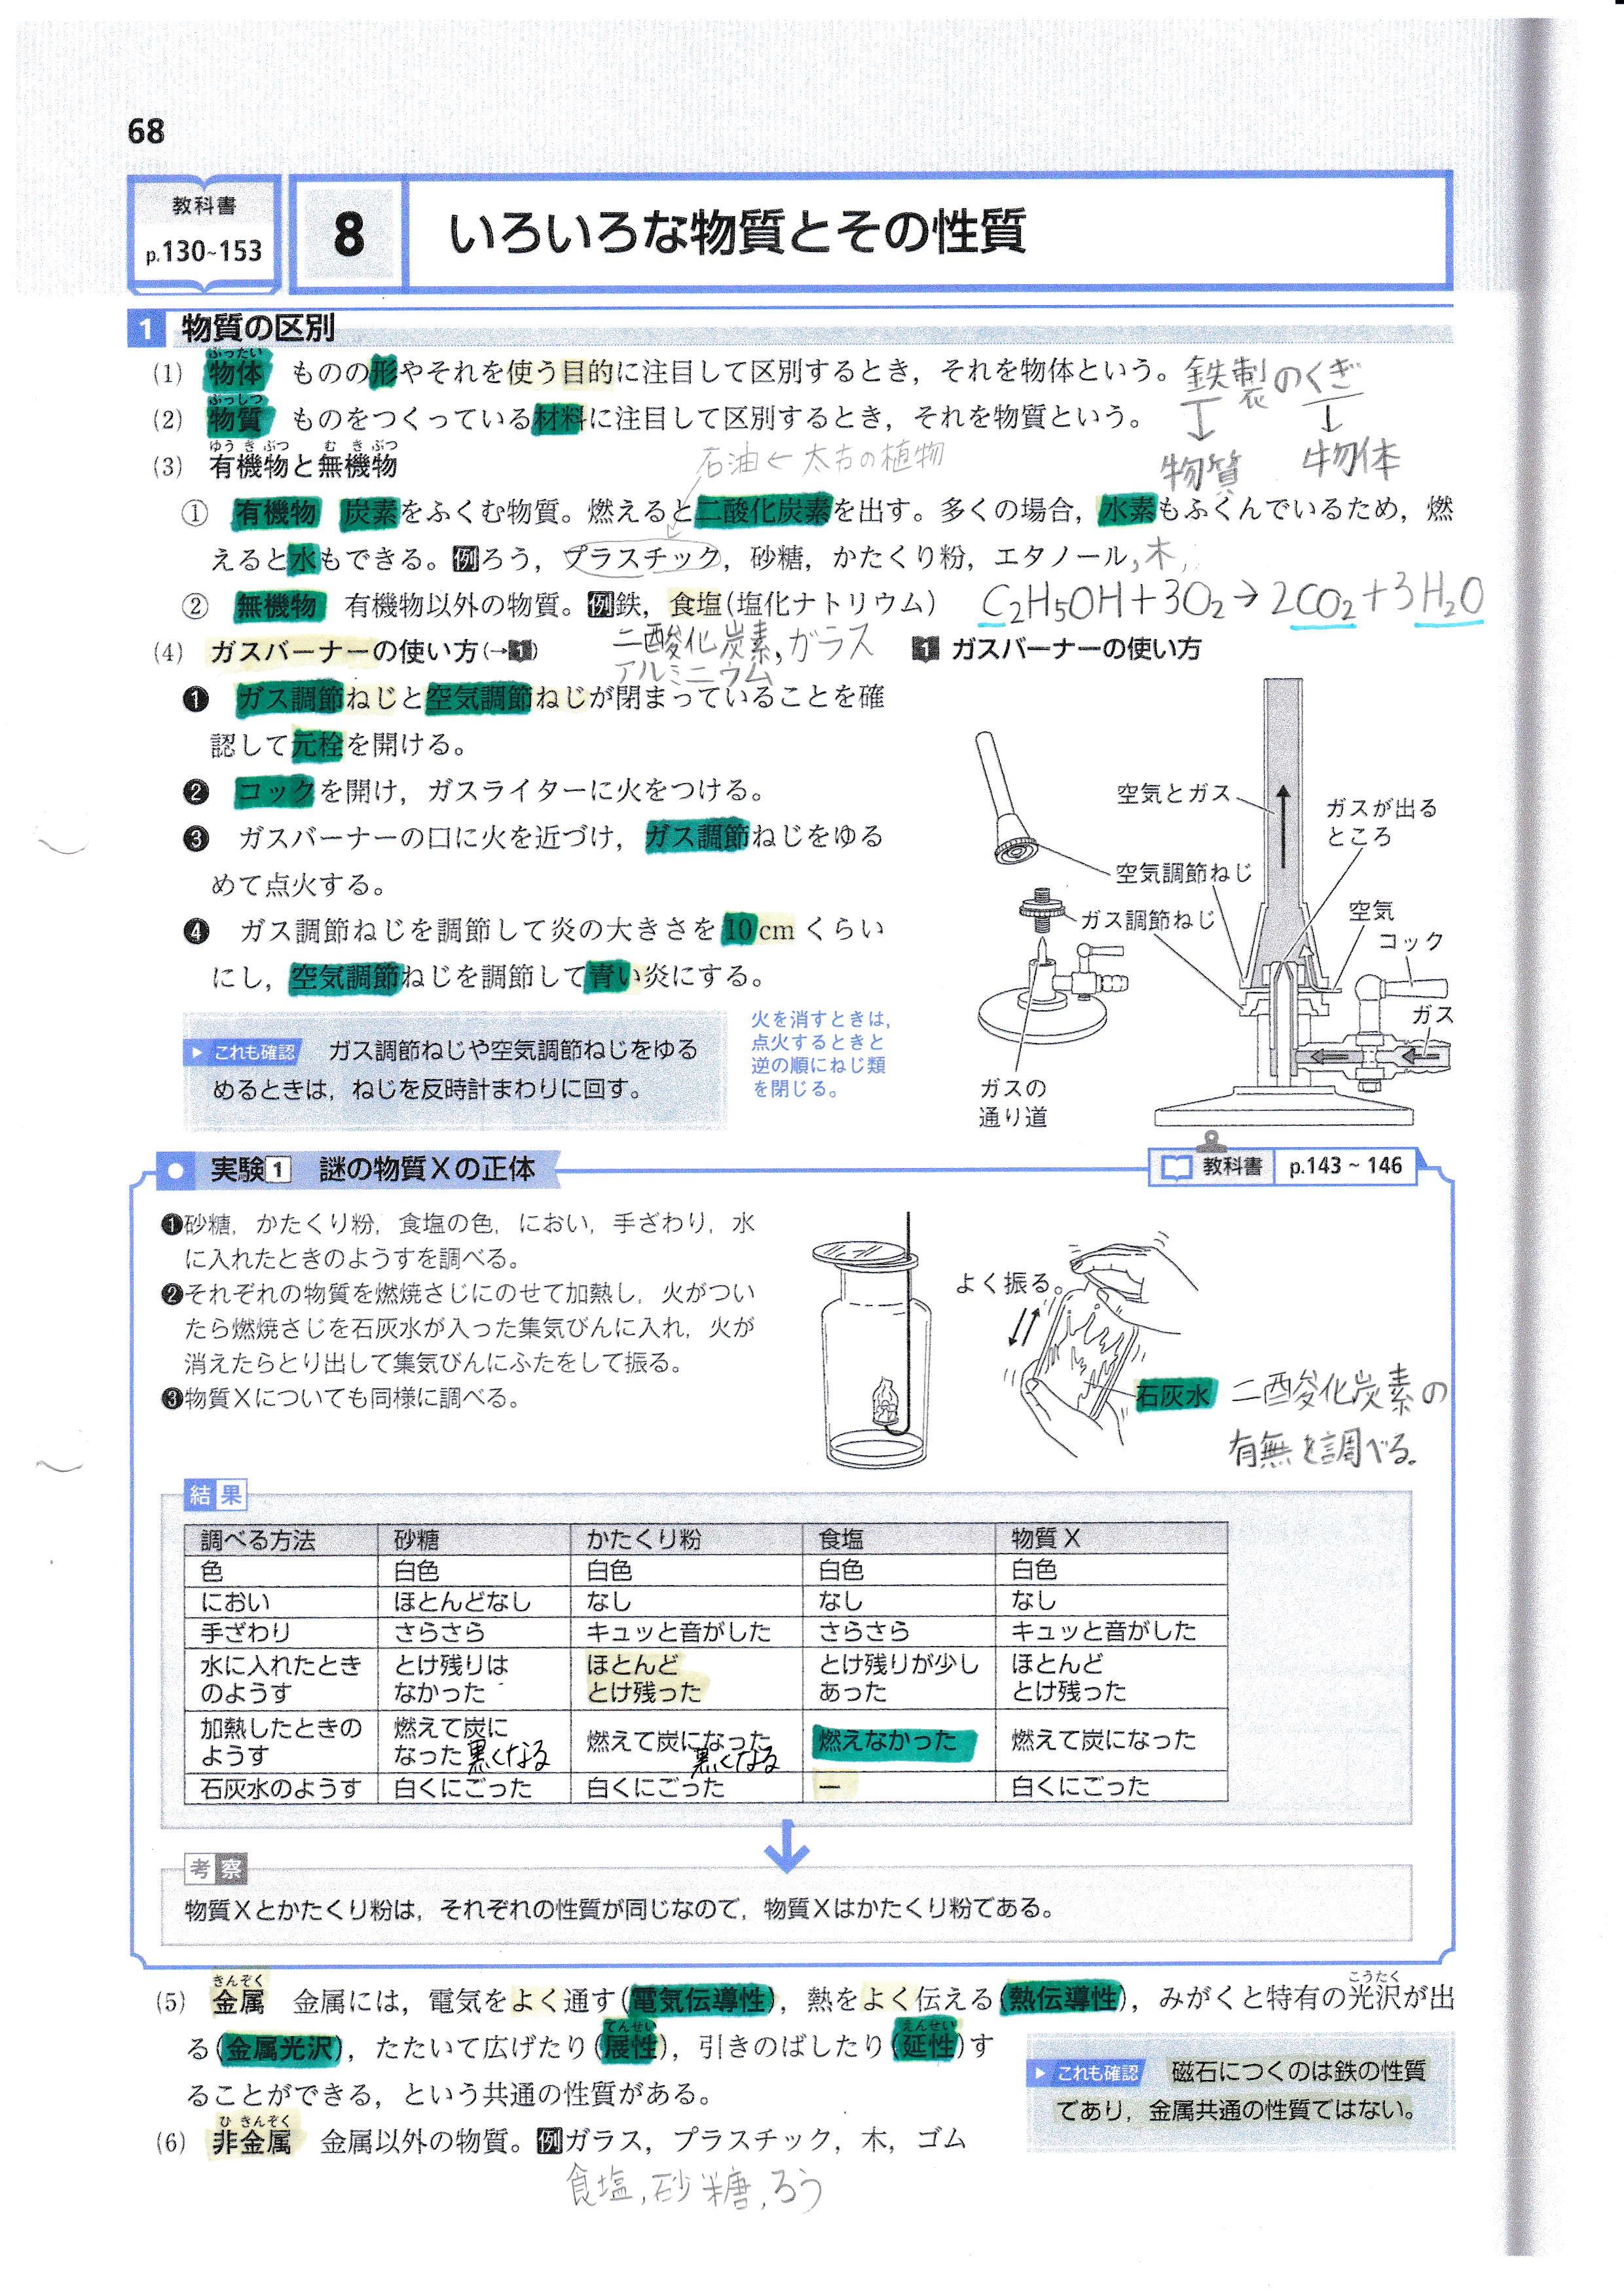 IMG_20211006_0003.jpg